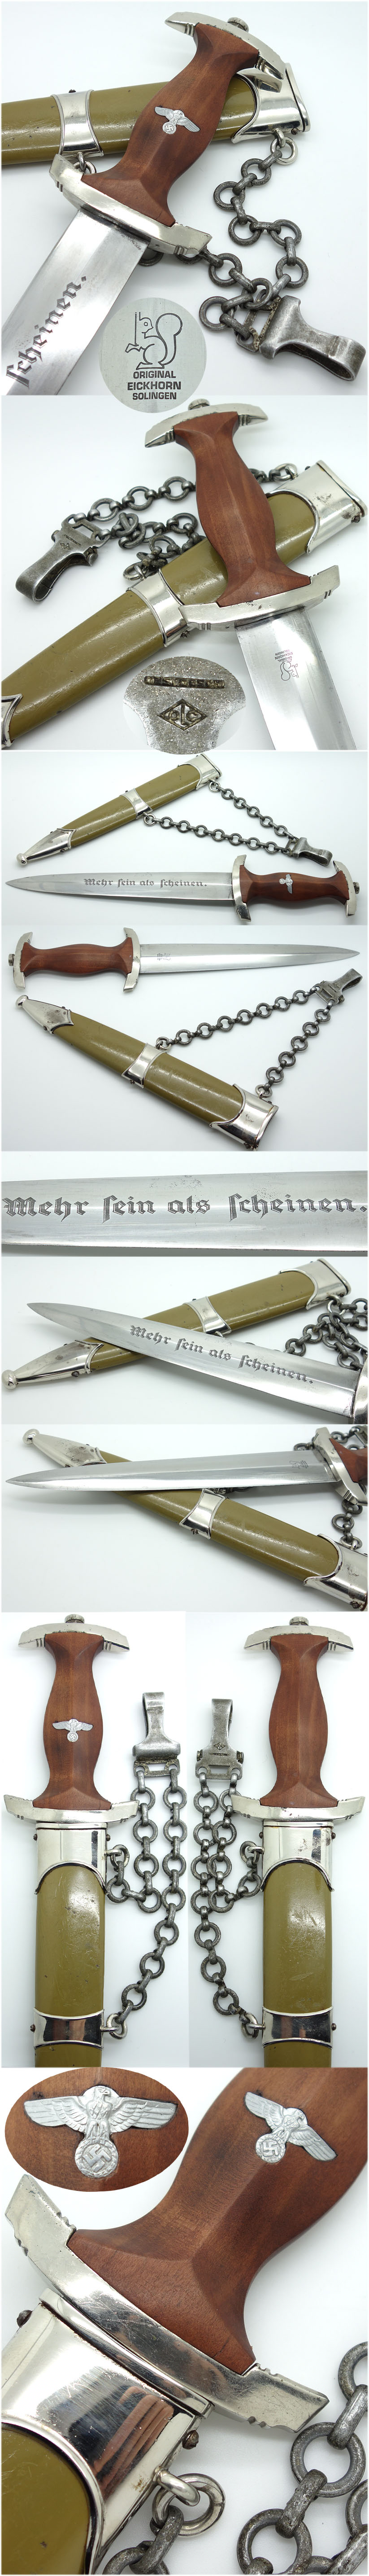 NPEA Leader Dagger By Eickhorn